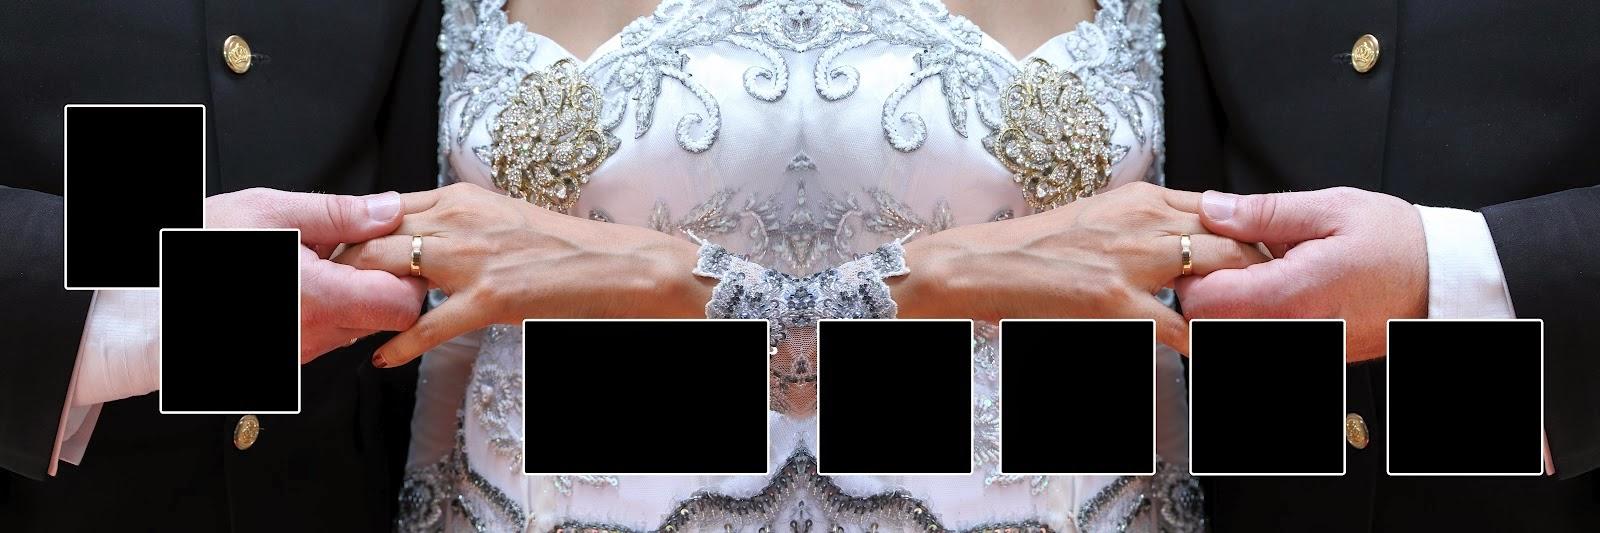 this photoshop backgrounds psd karizma album background and furniture design ideas photos and images are high - Wedding Album Design Ideas